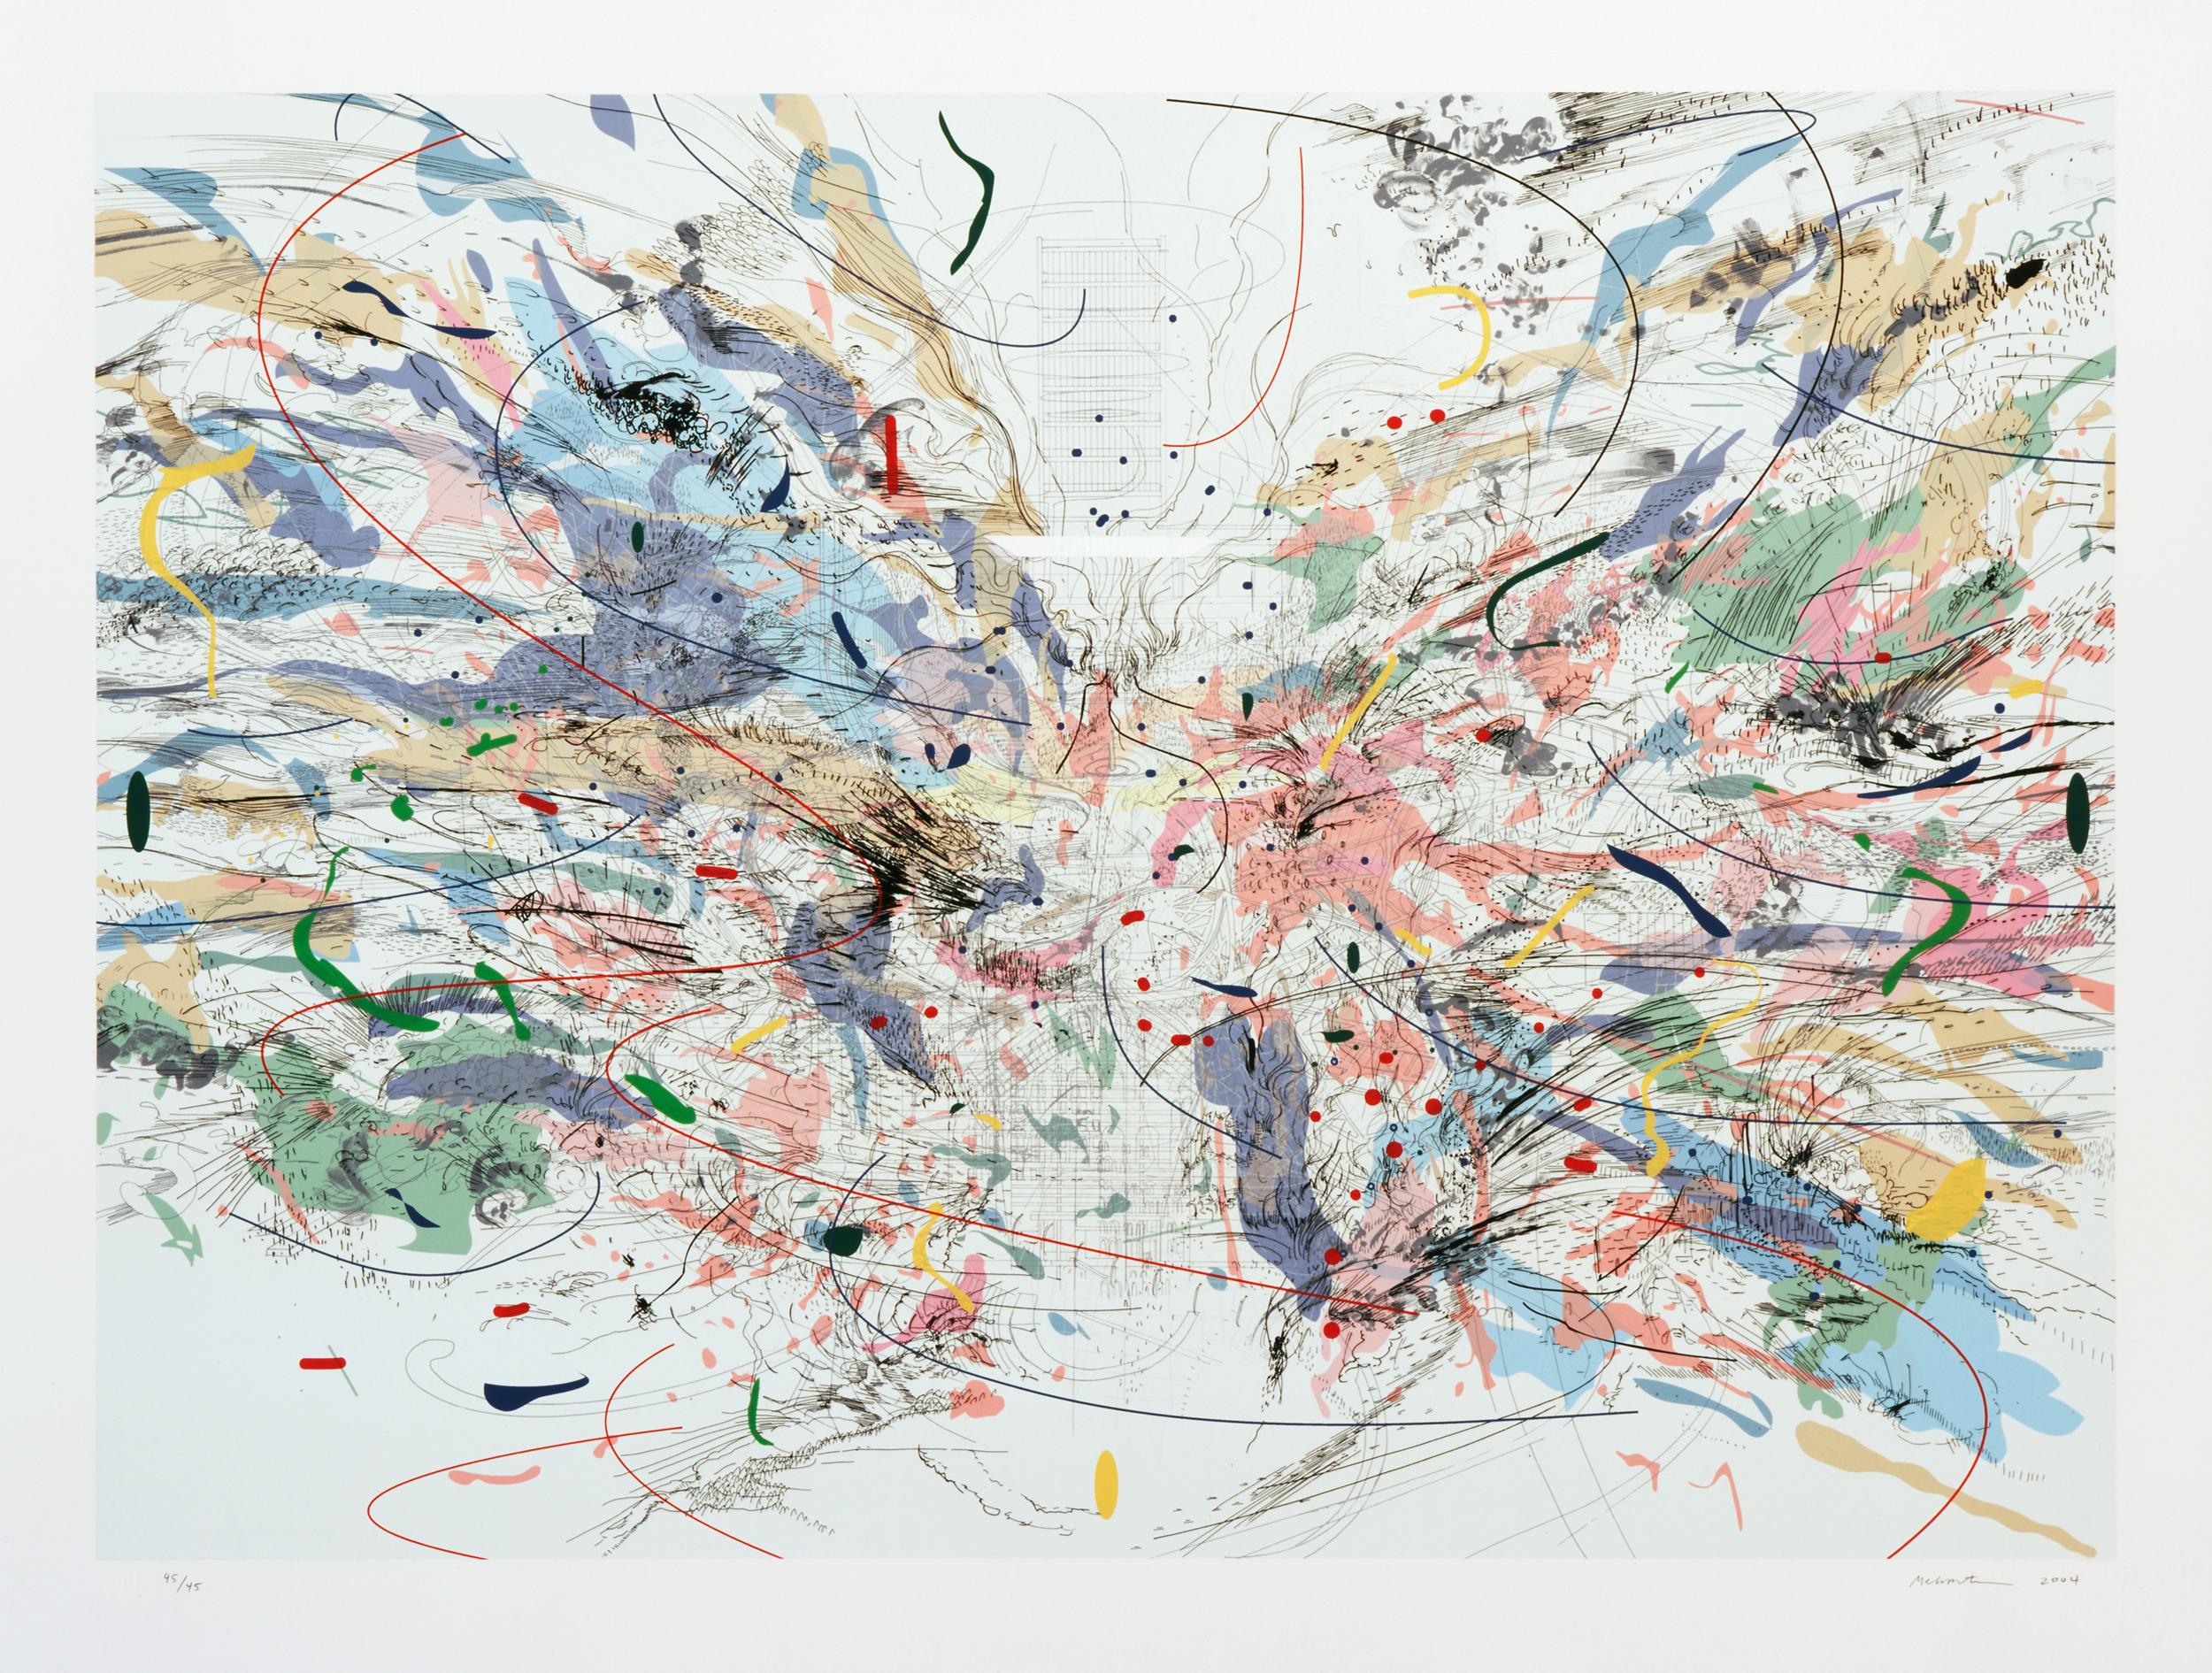 """Entropia (review)"" by Julie Mehretu 2004"